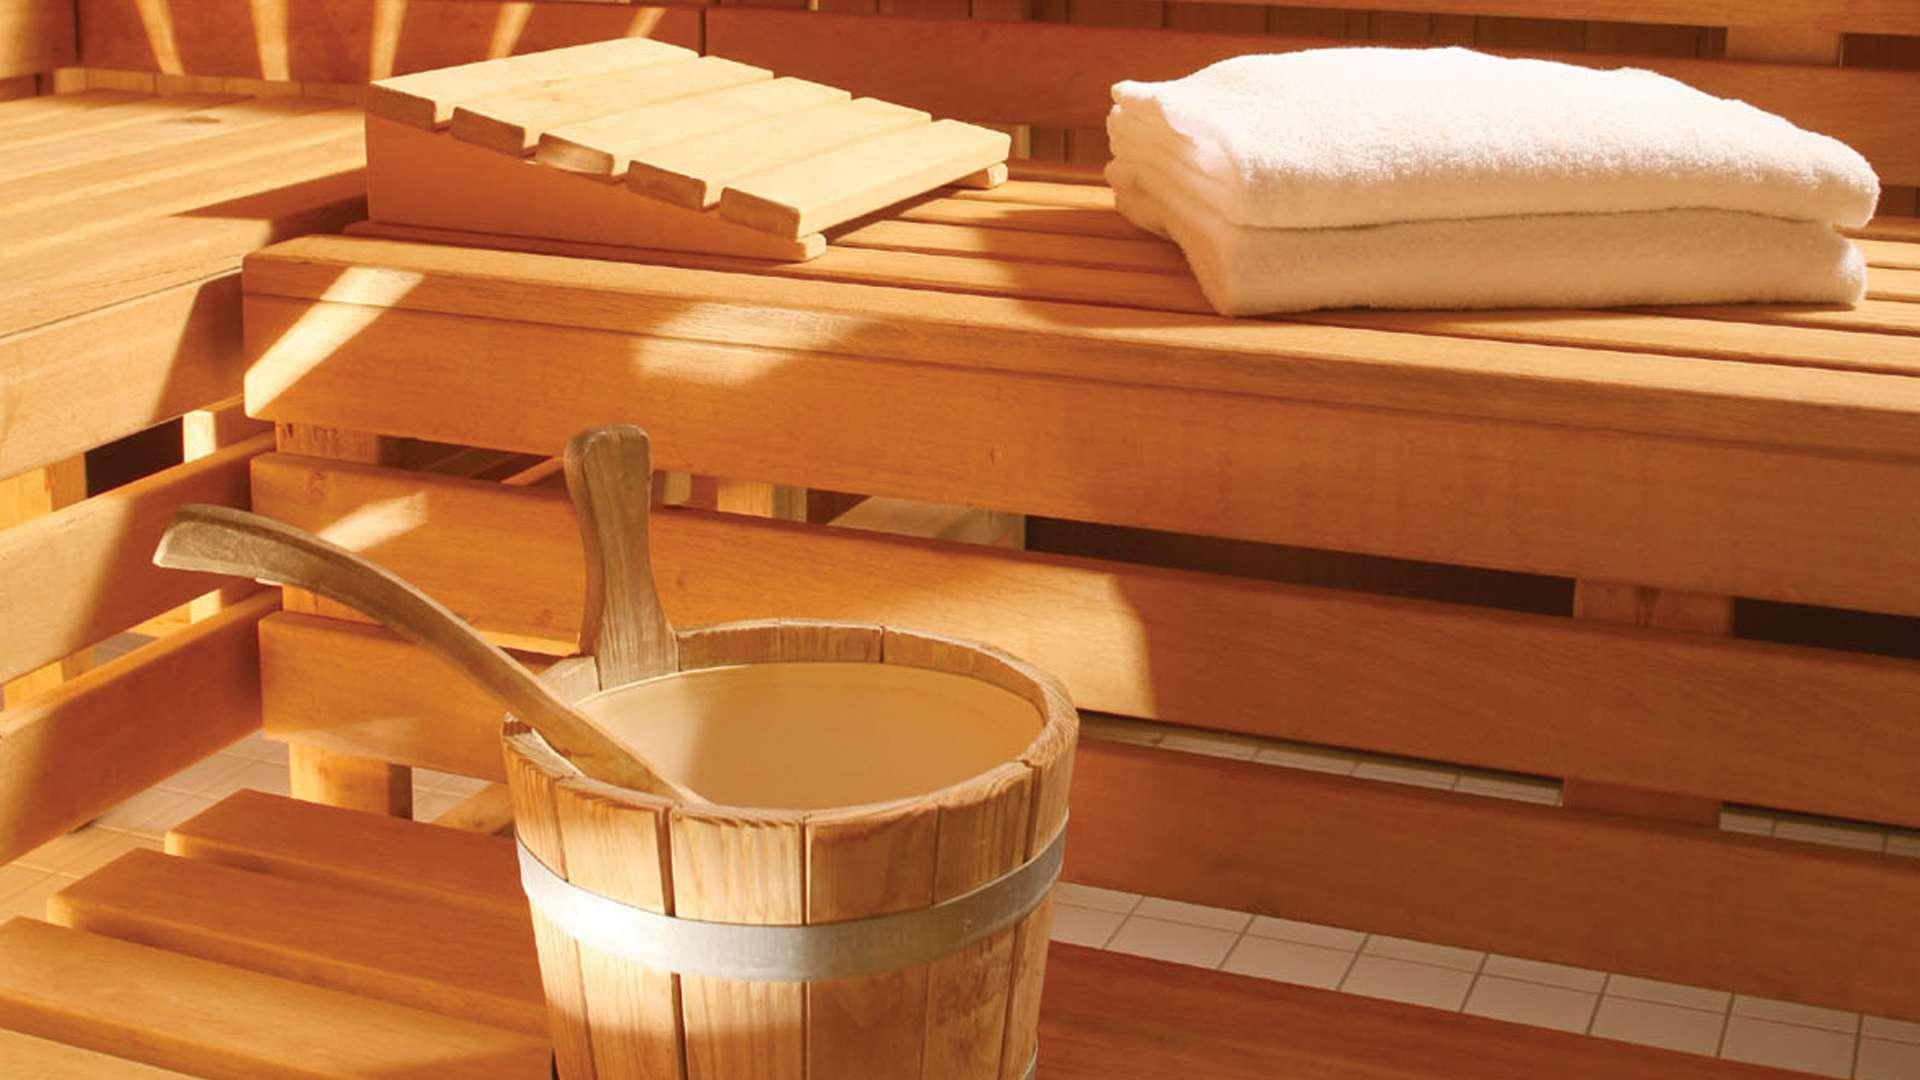 sauna california fitness u rehasport zentrum. Black Bedroom Furniture Sets. Home Design Ideas